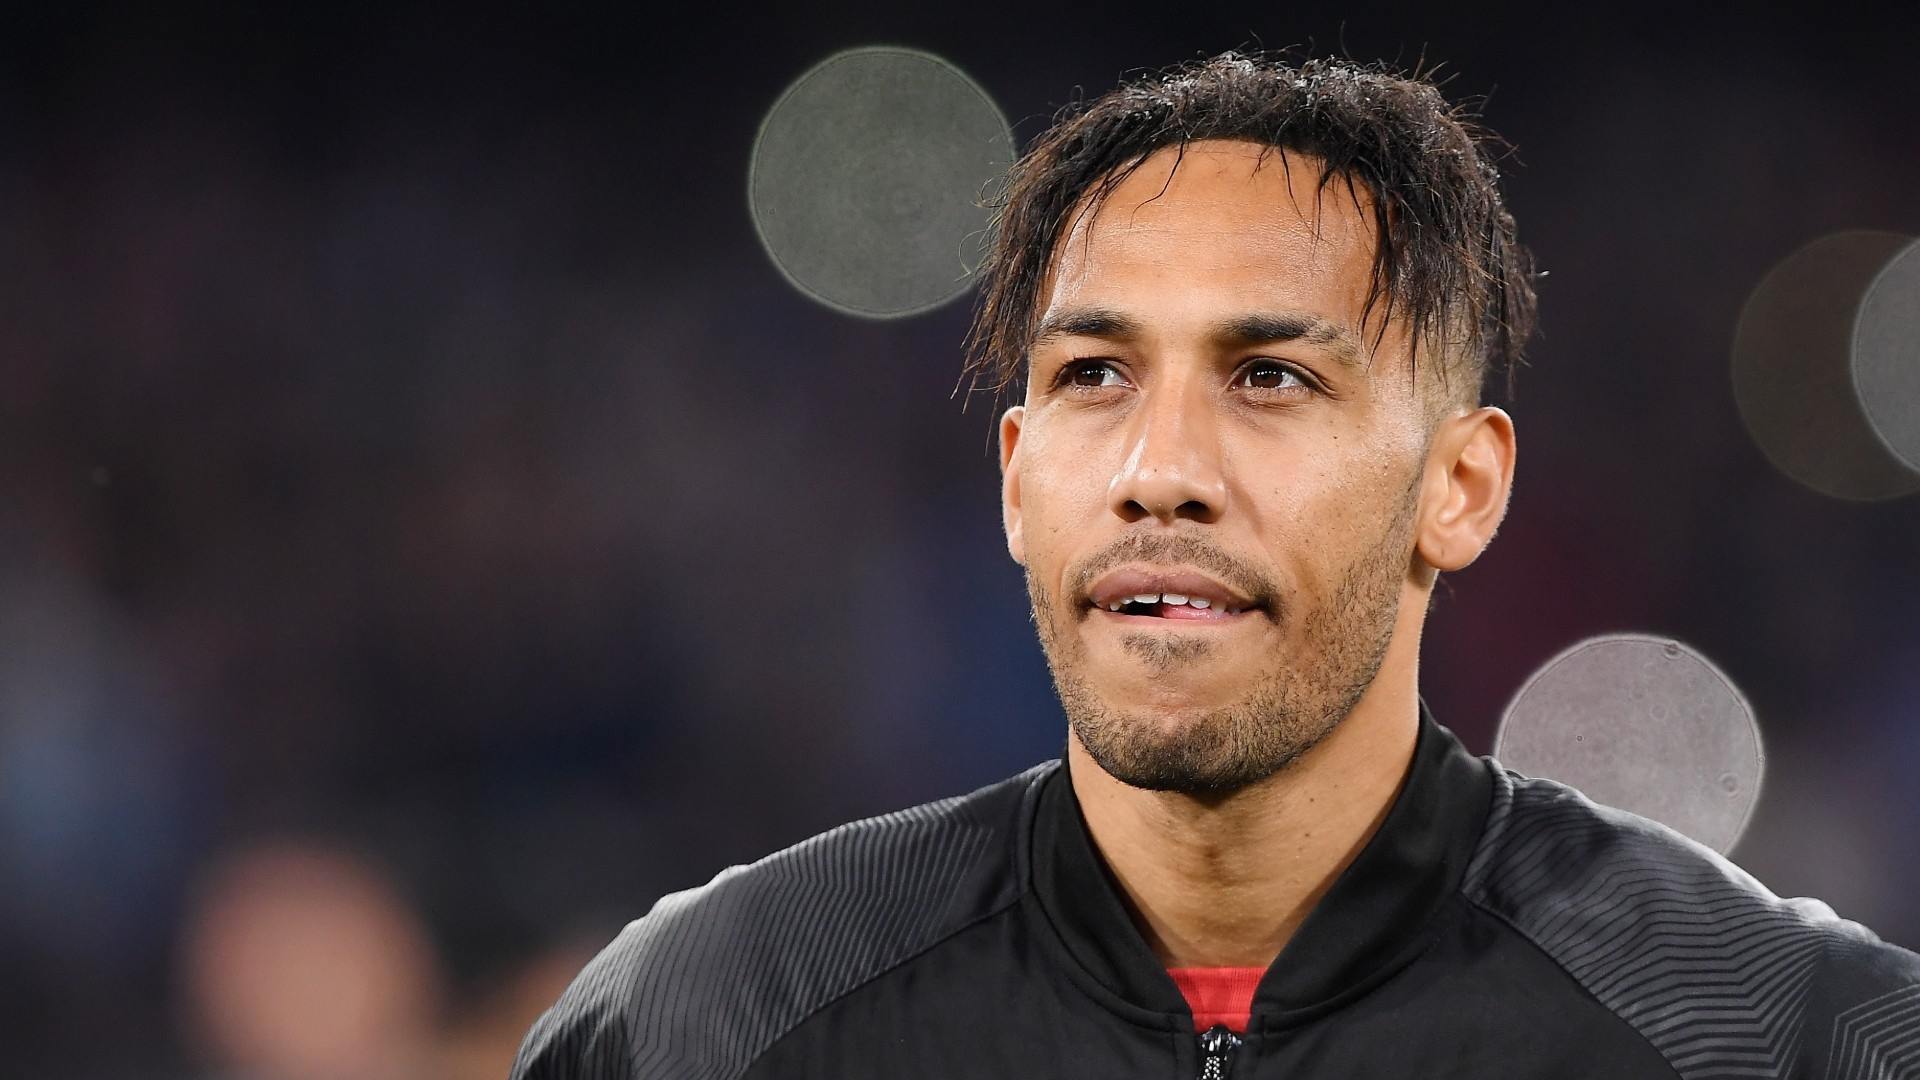 Pierre Emerick-Aubameyang Arsenal 2018/19